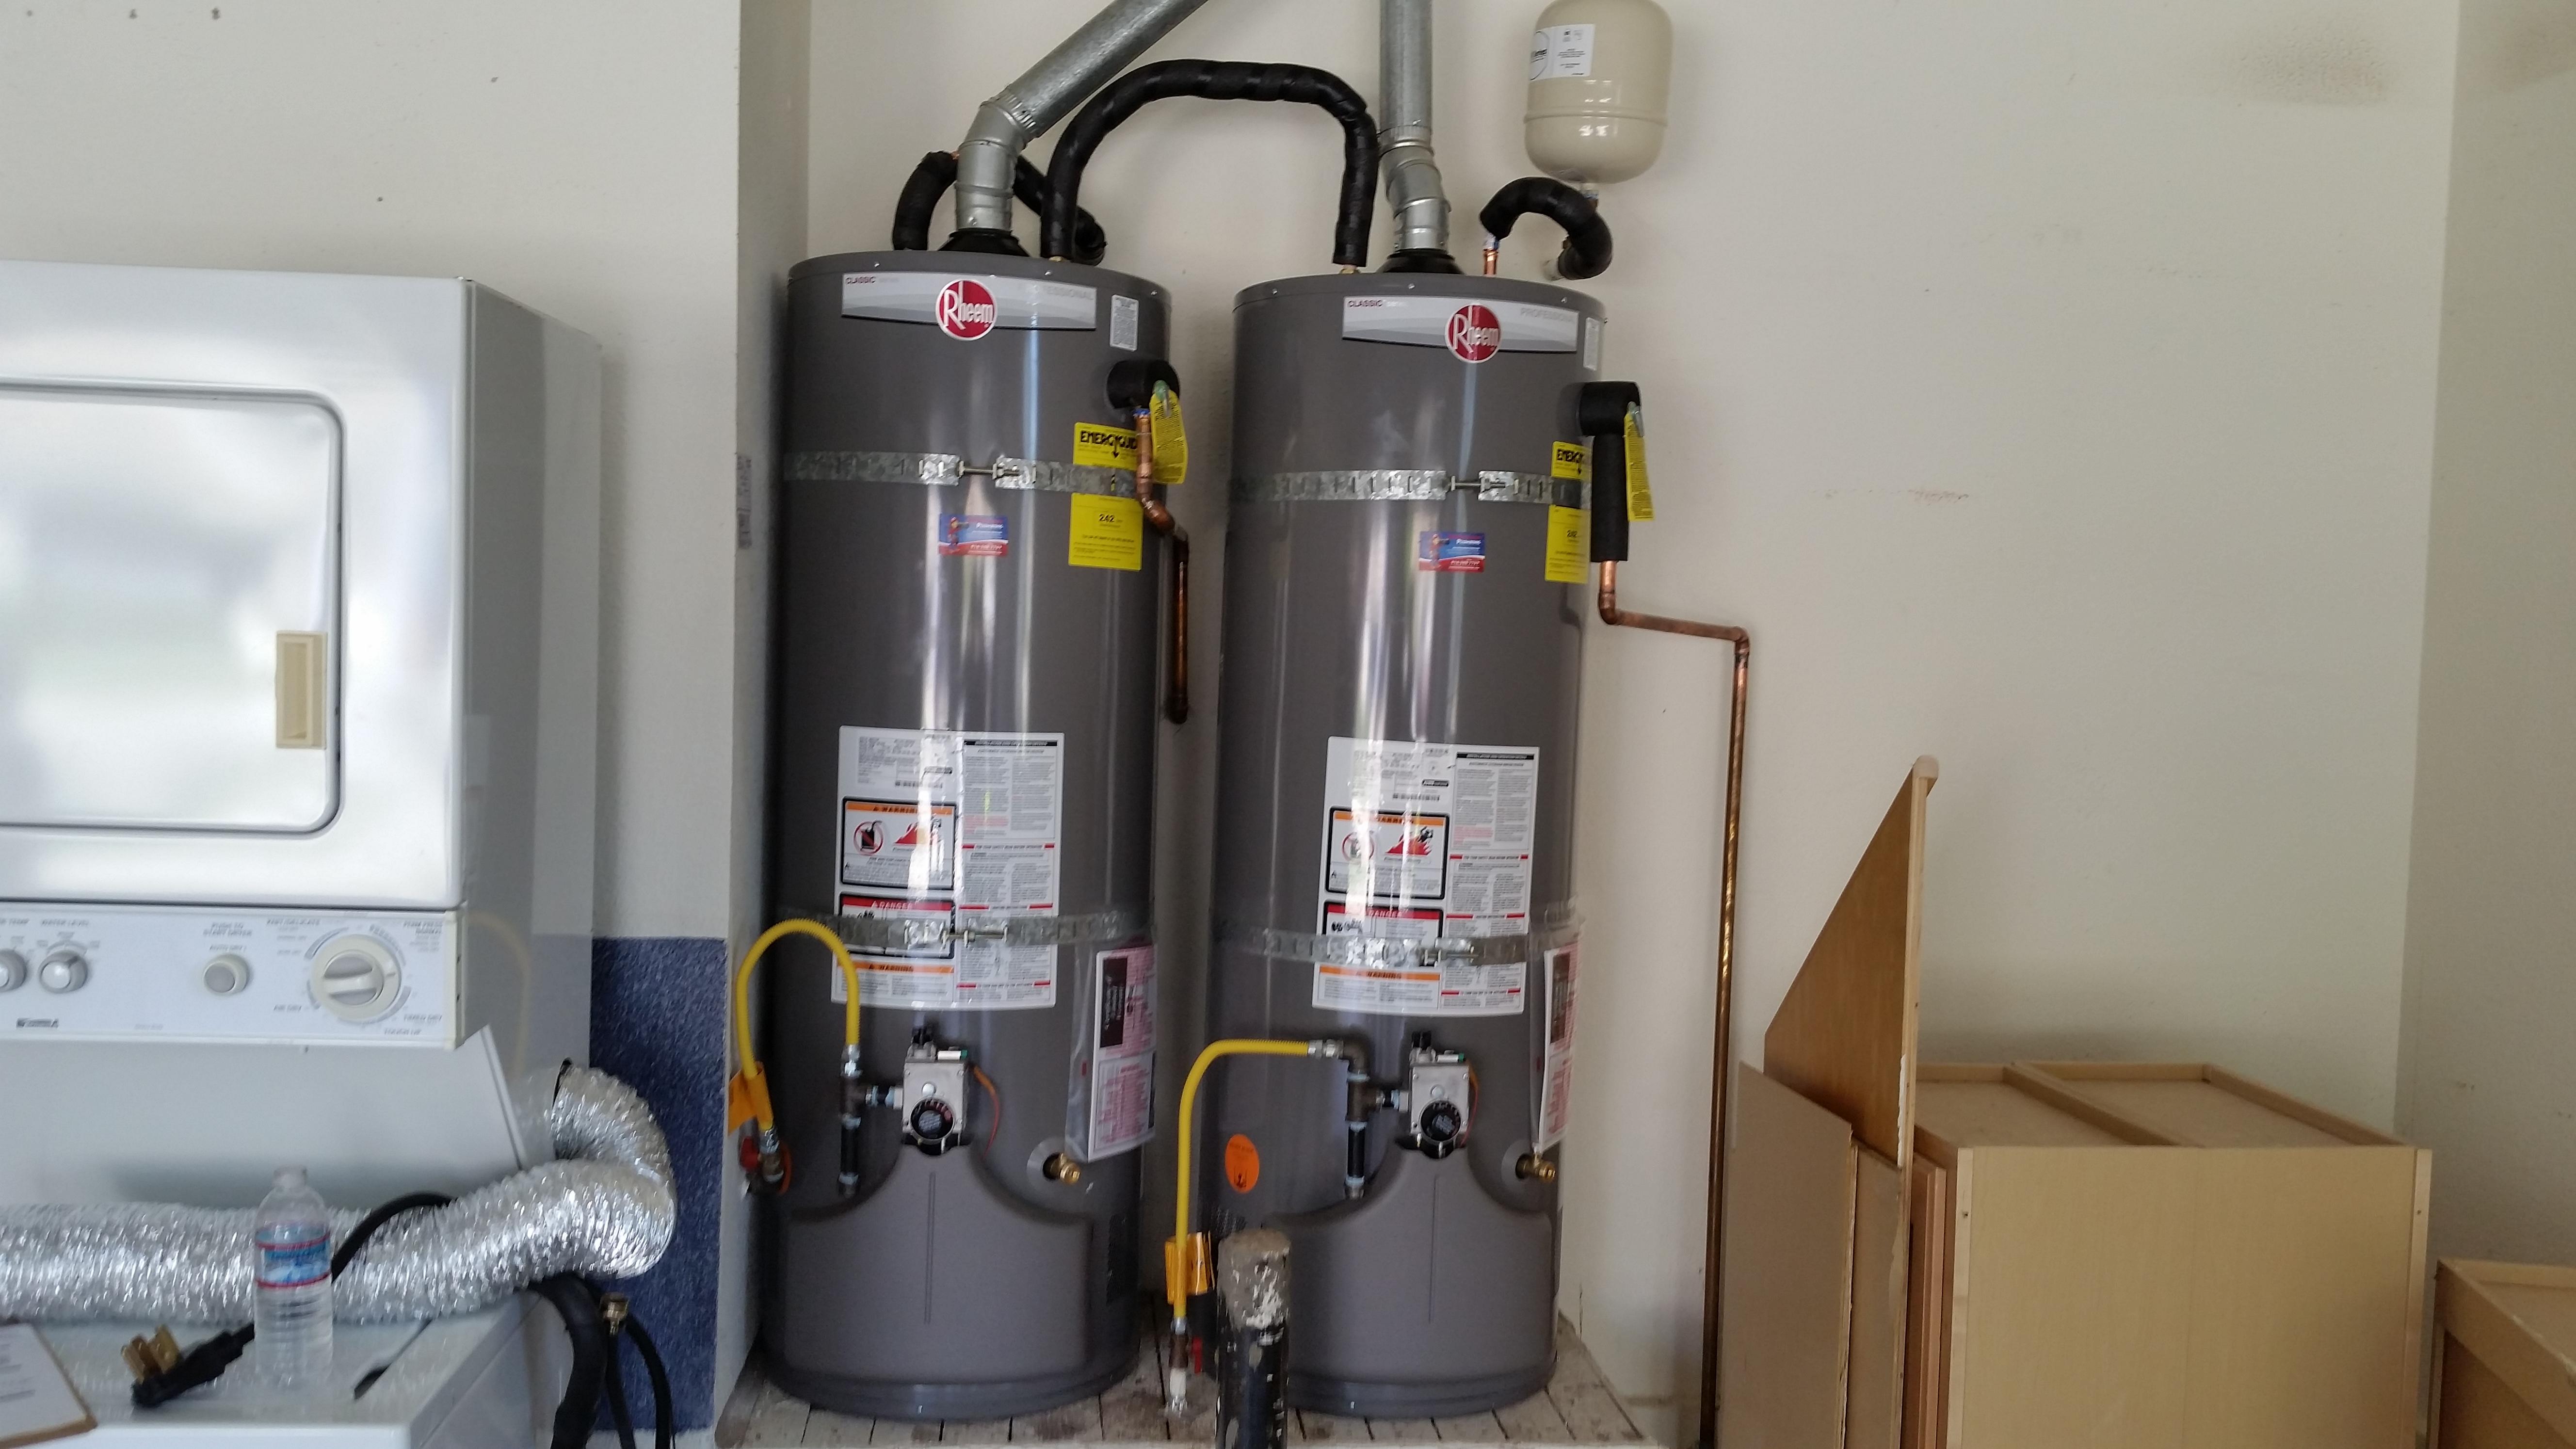 bc plumbing supply standard locations sacramento